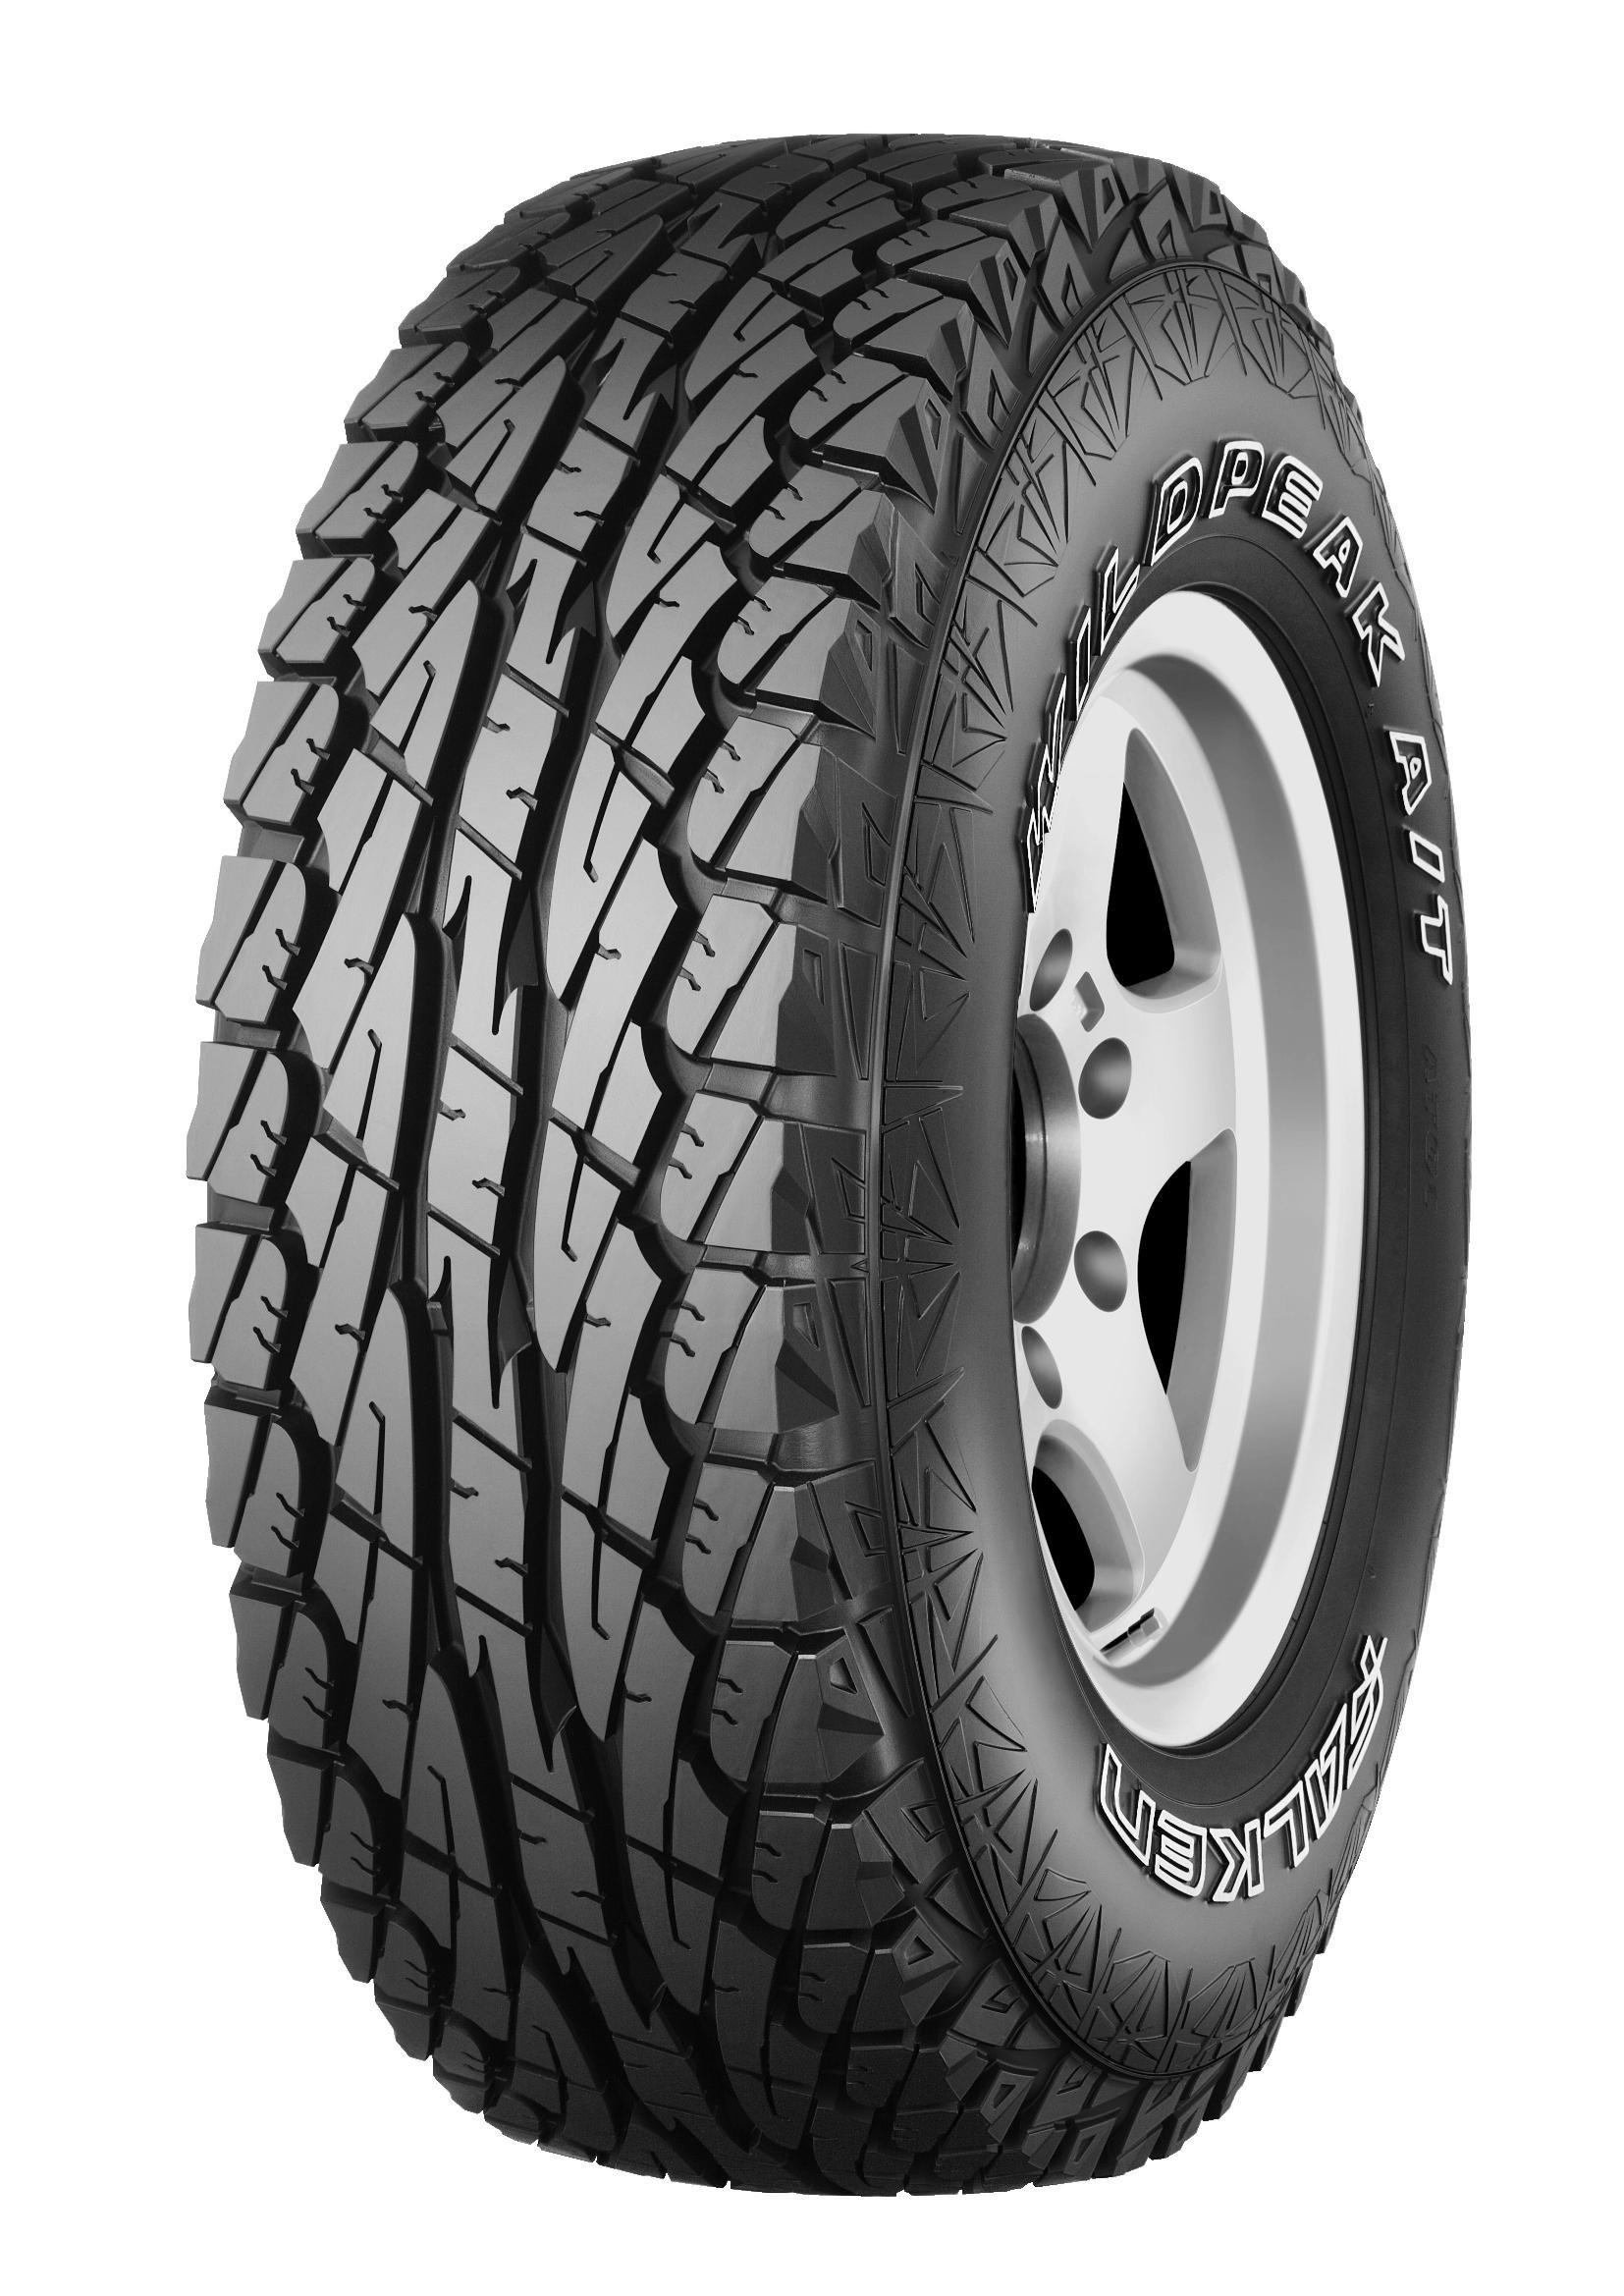 Neumático FALKEN WILDPEAK A/T AT01 275/65R17 115 H